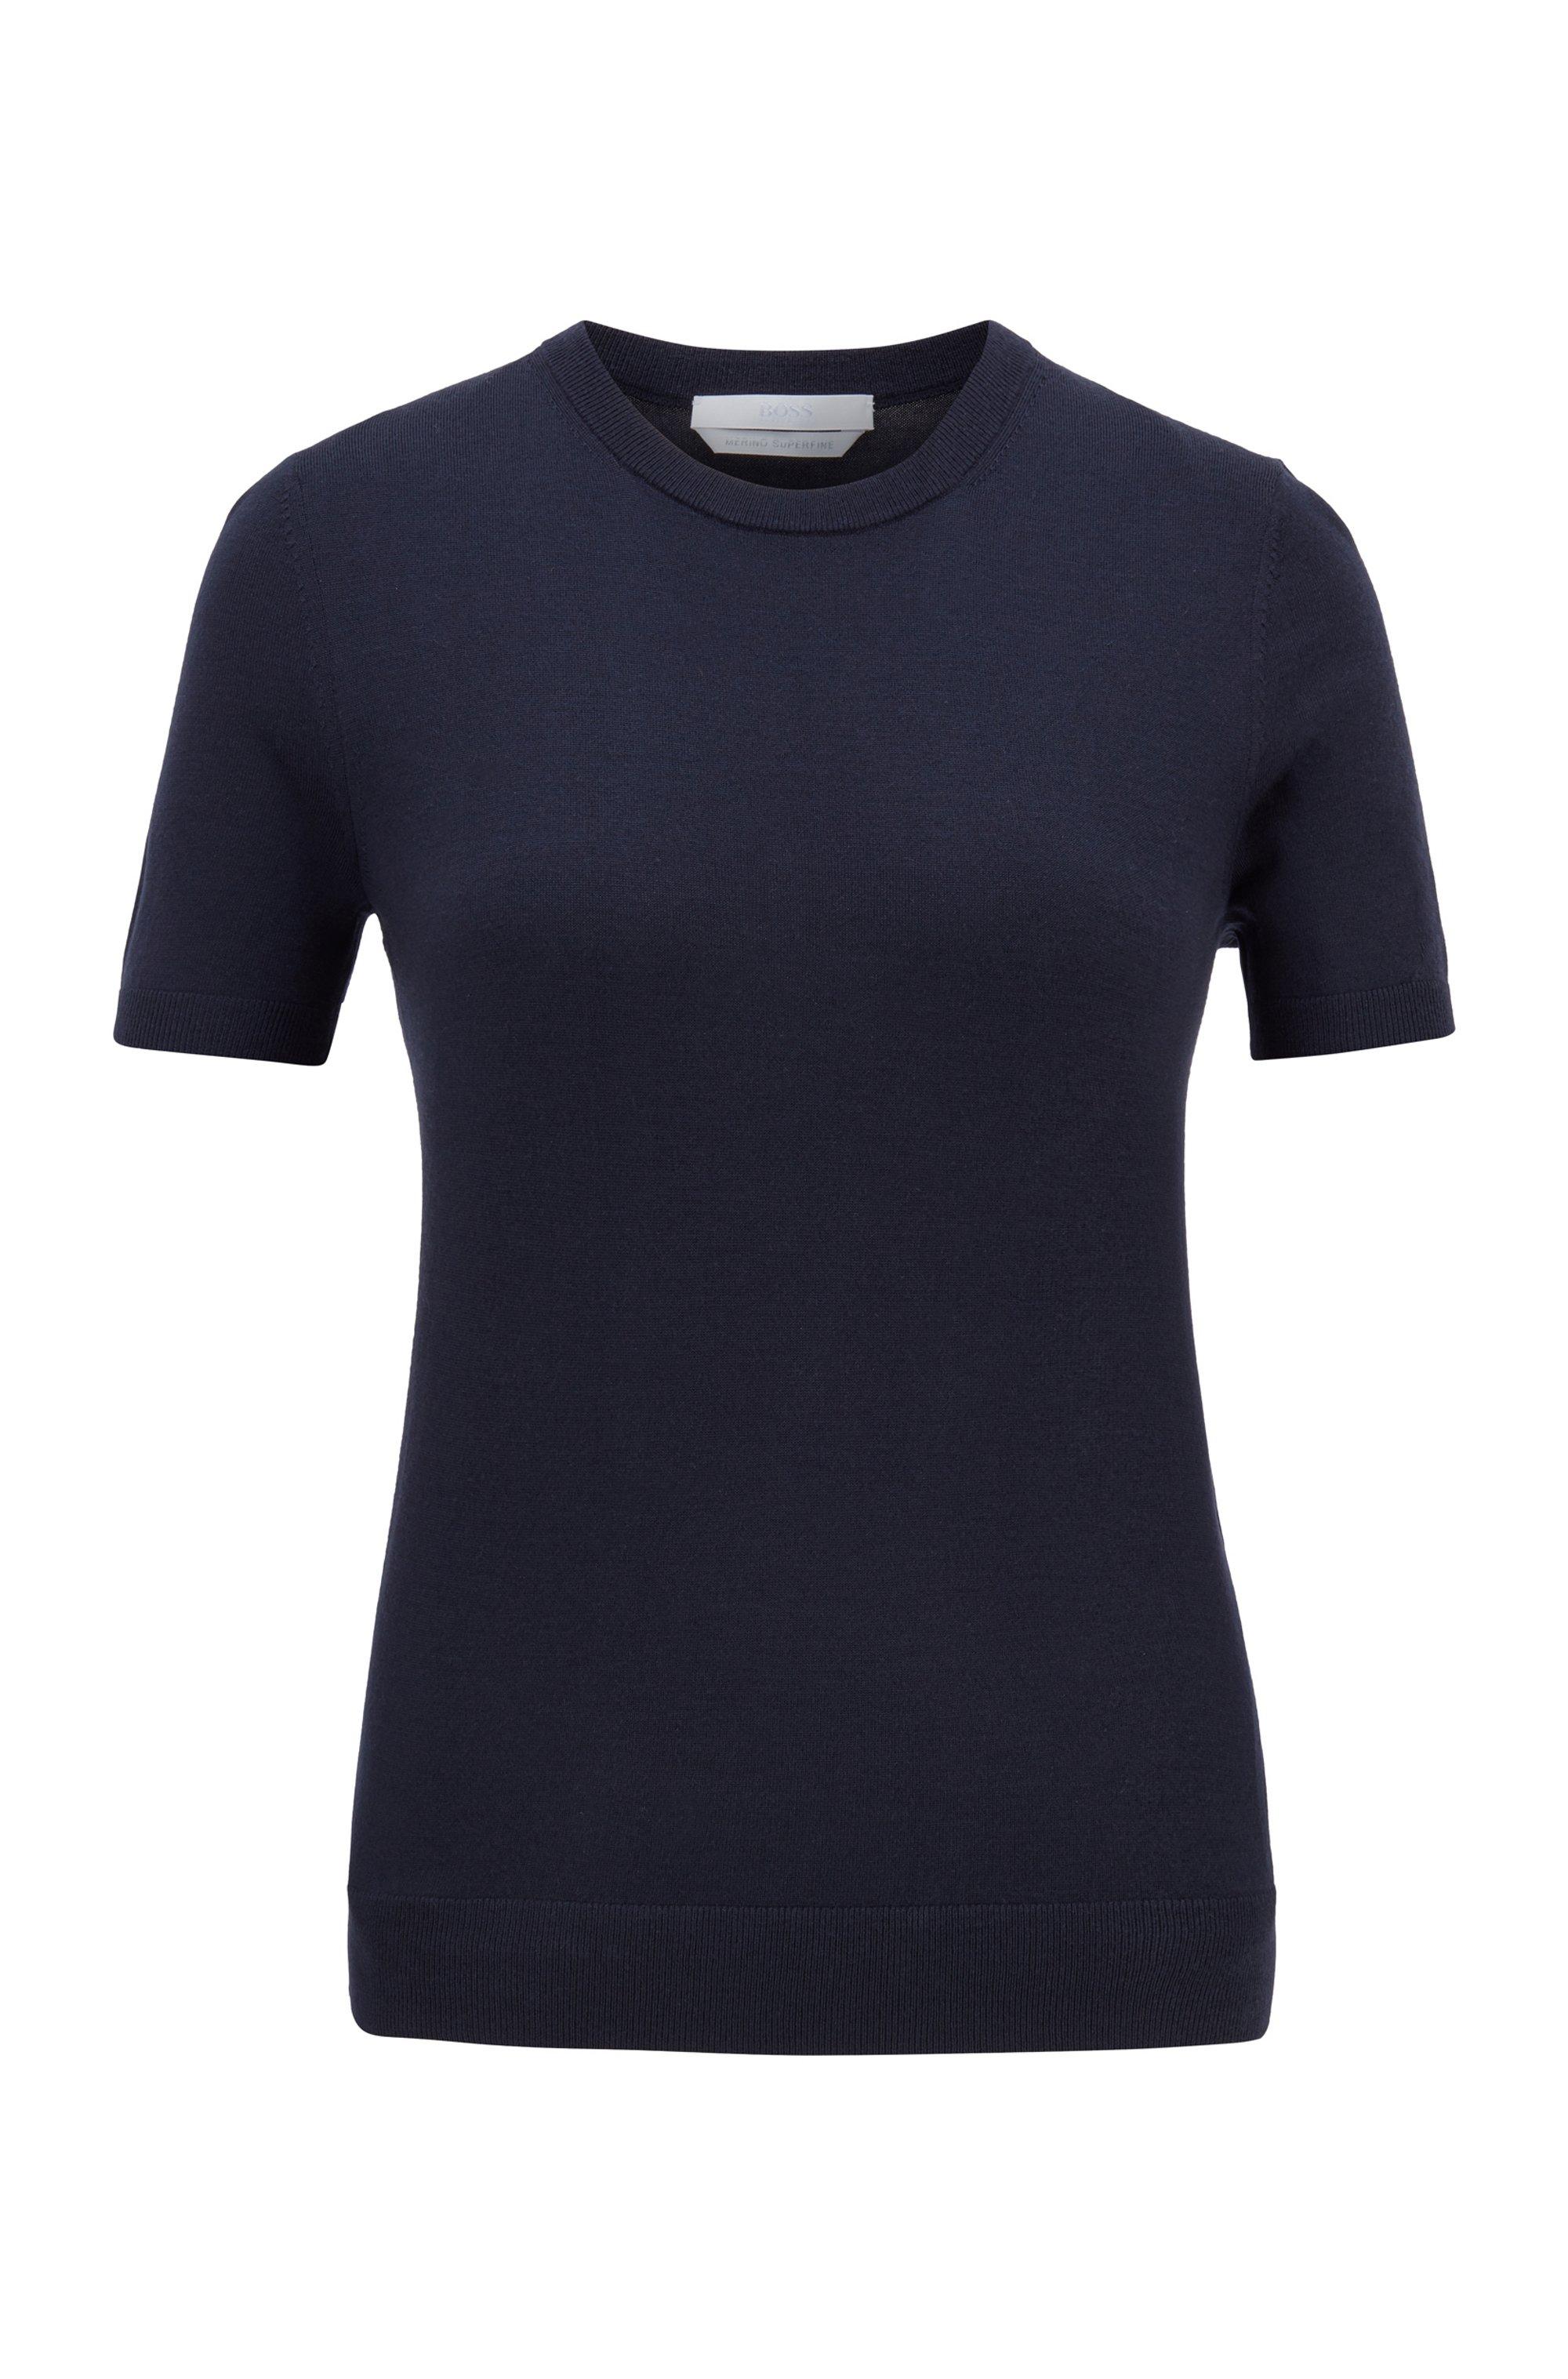 Jersey de manga corta en lana virgen, Azul oscuro